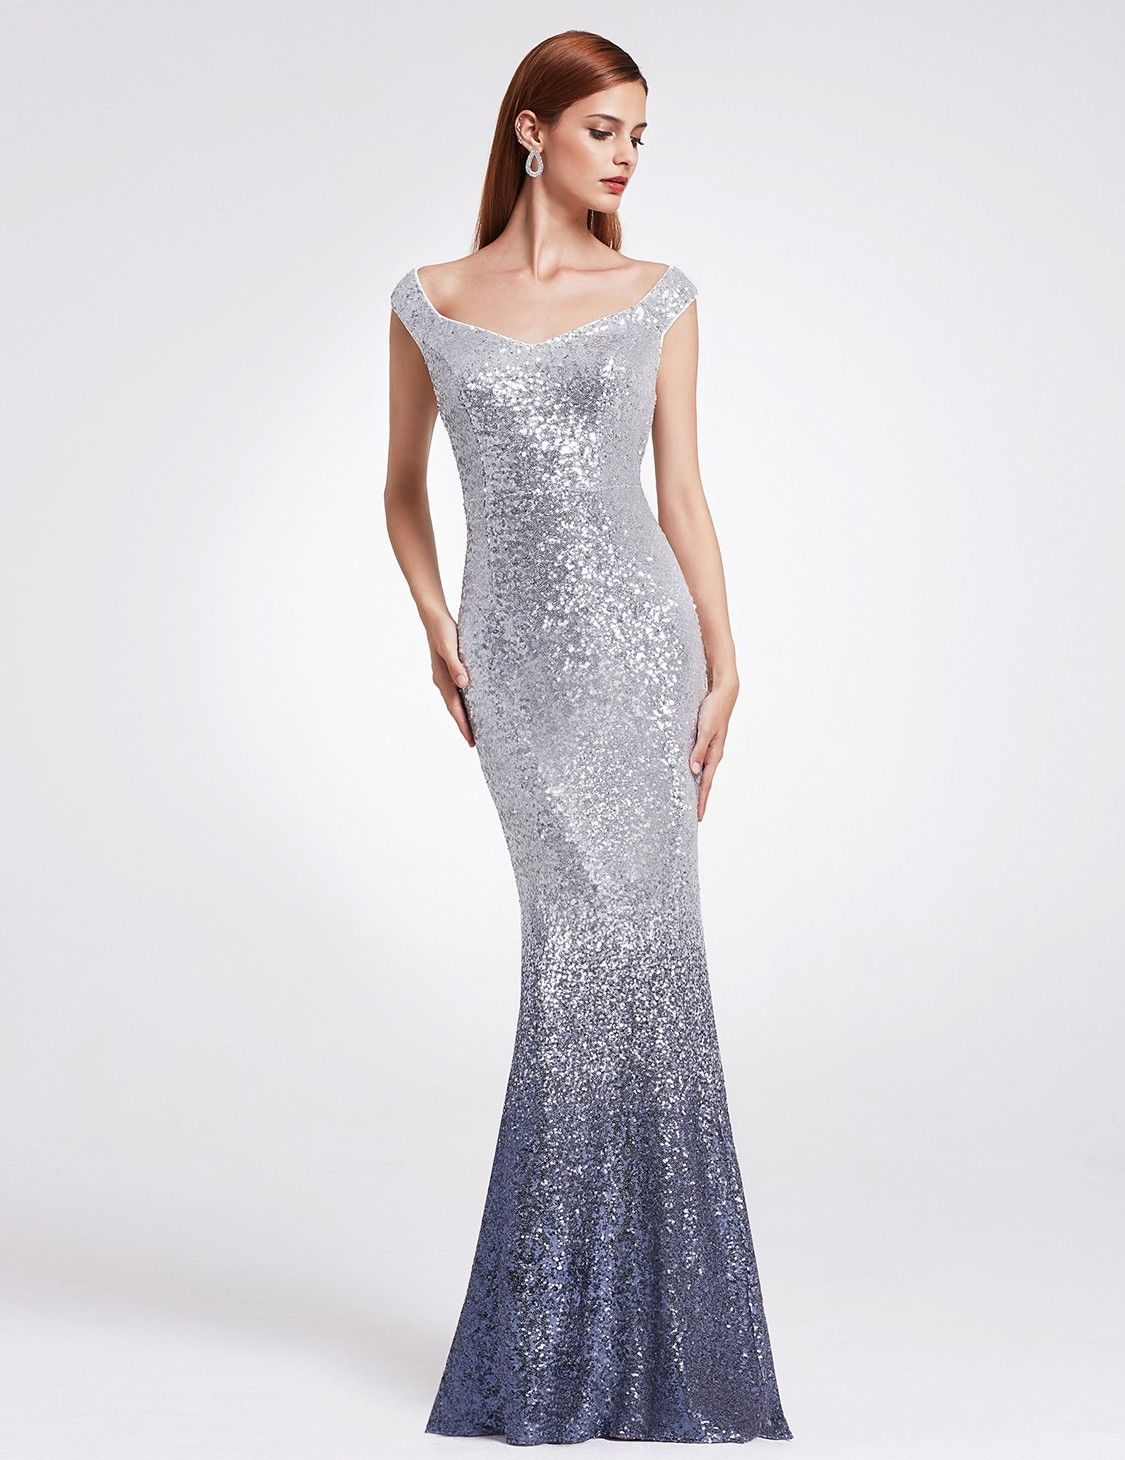 0c0b386129 Love Sparkles Off Shoulder Floor Length Sequins Evening Gown | Ever-Pretty  #prom #promdress #promidea #EverPretty #sequindress #sparklingdress